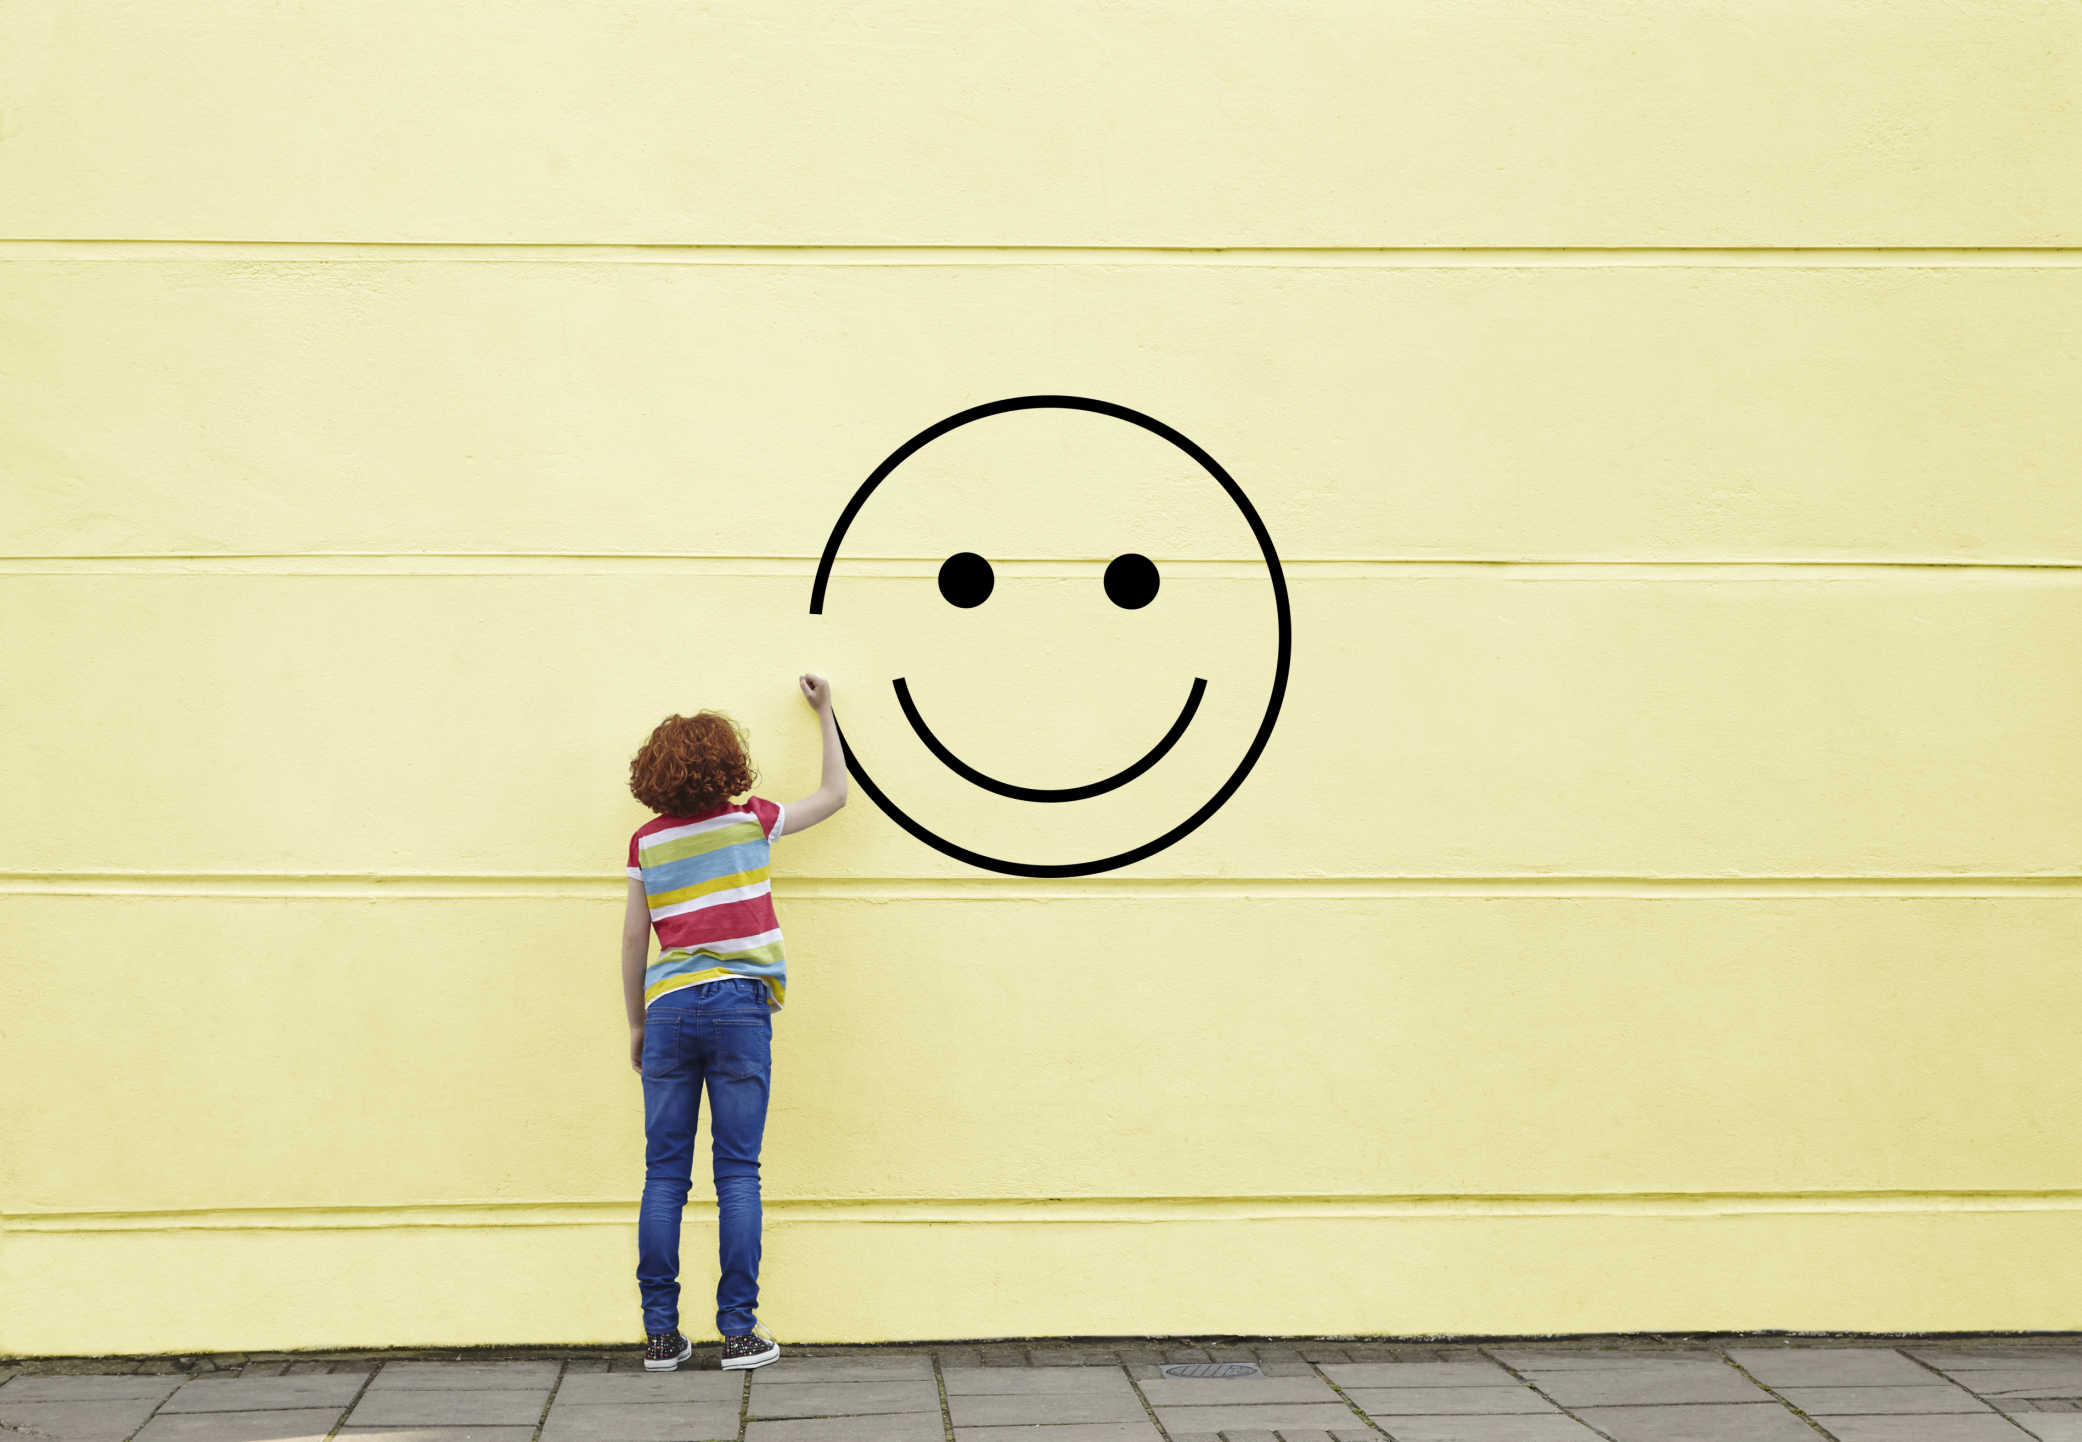 https://libapps.s3.amazonaws.com/accounts/111476/images/Happiness.jpg